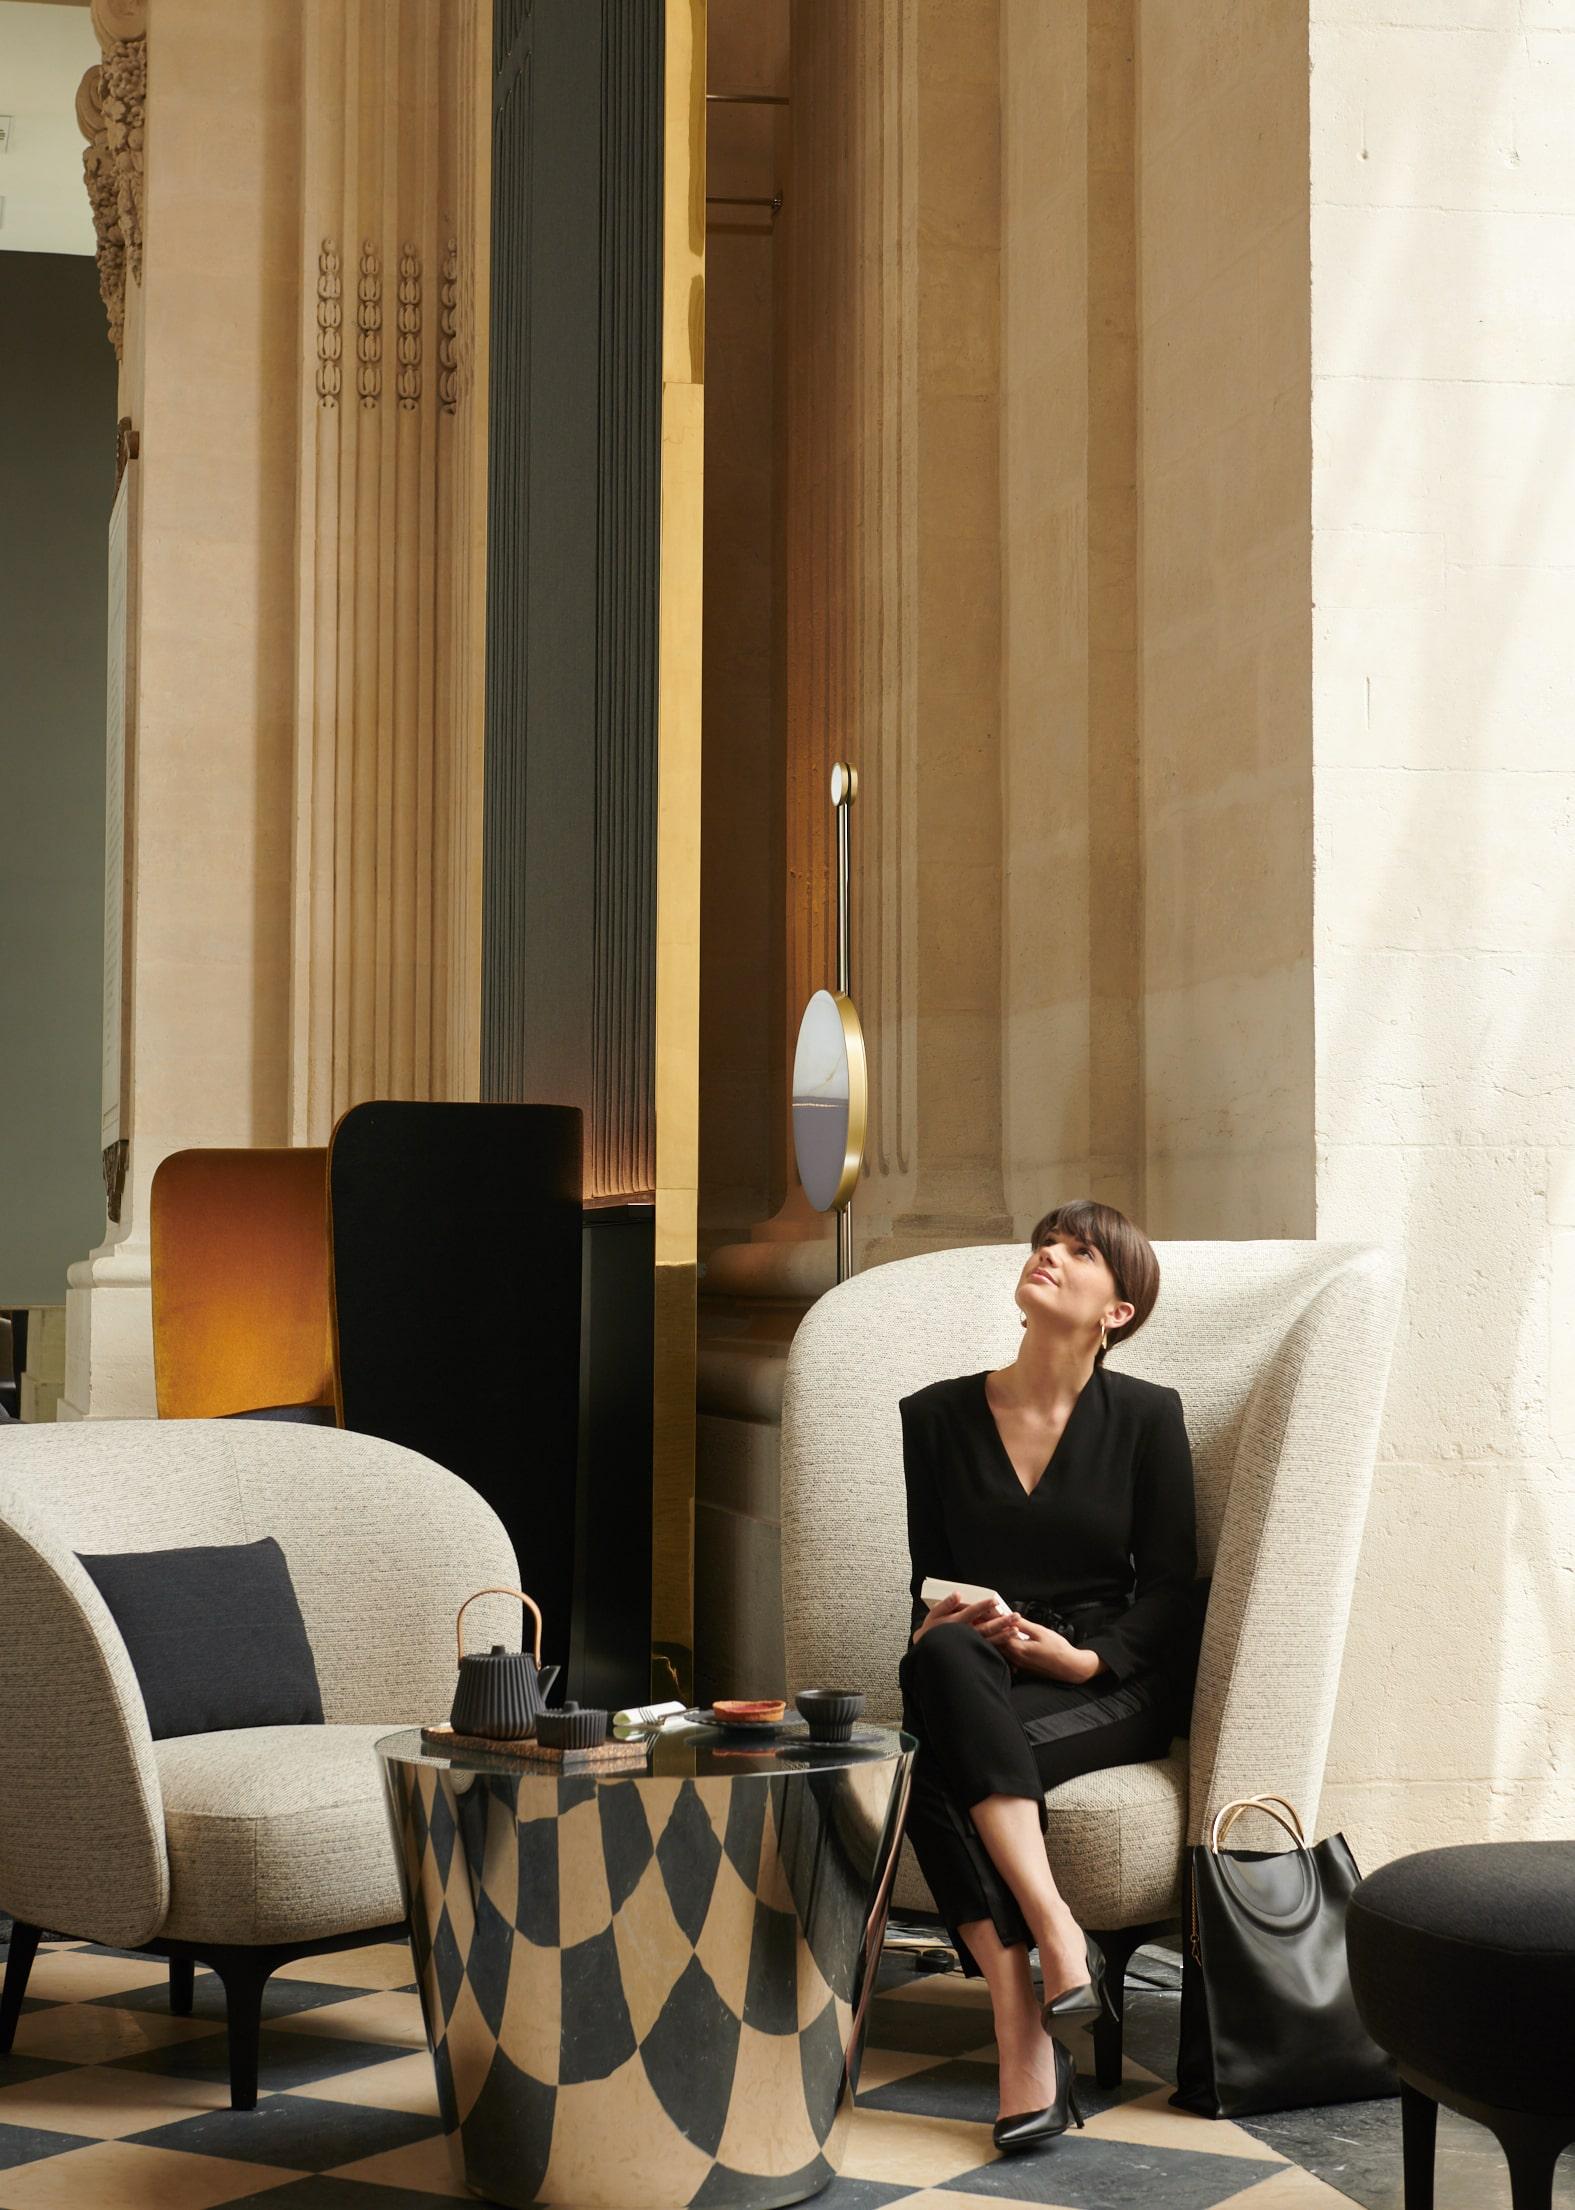 InterContinental Lyon - Hotel Dieu - bar Le Dome - tea time